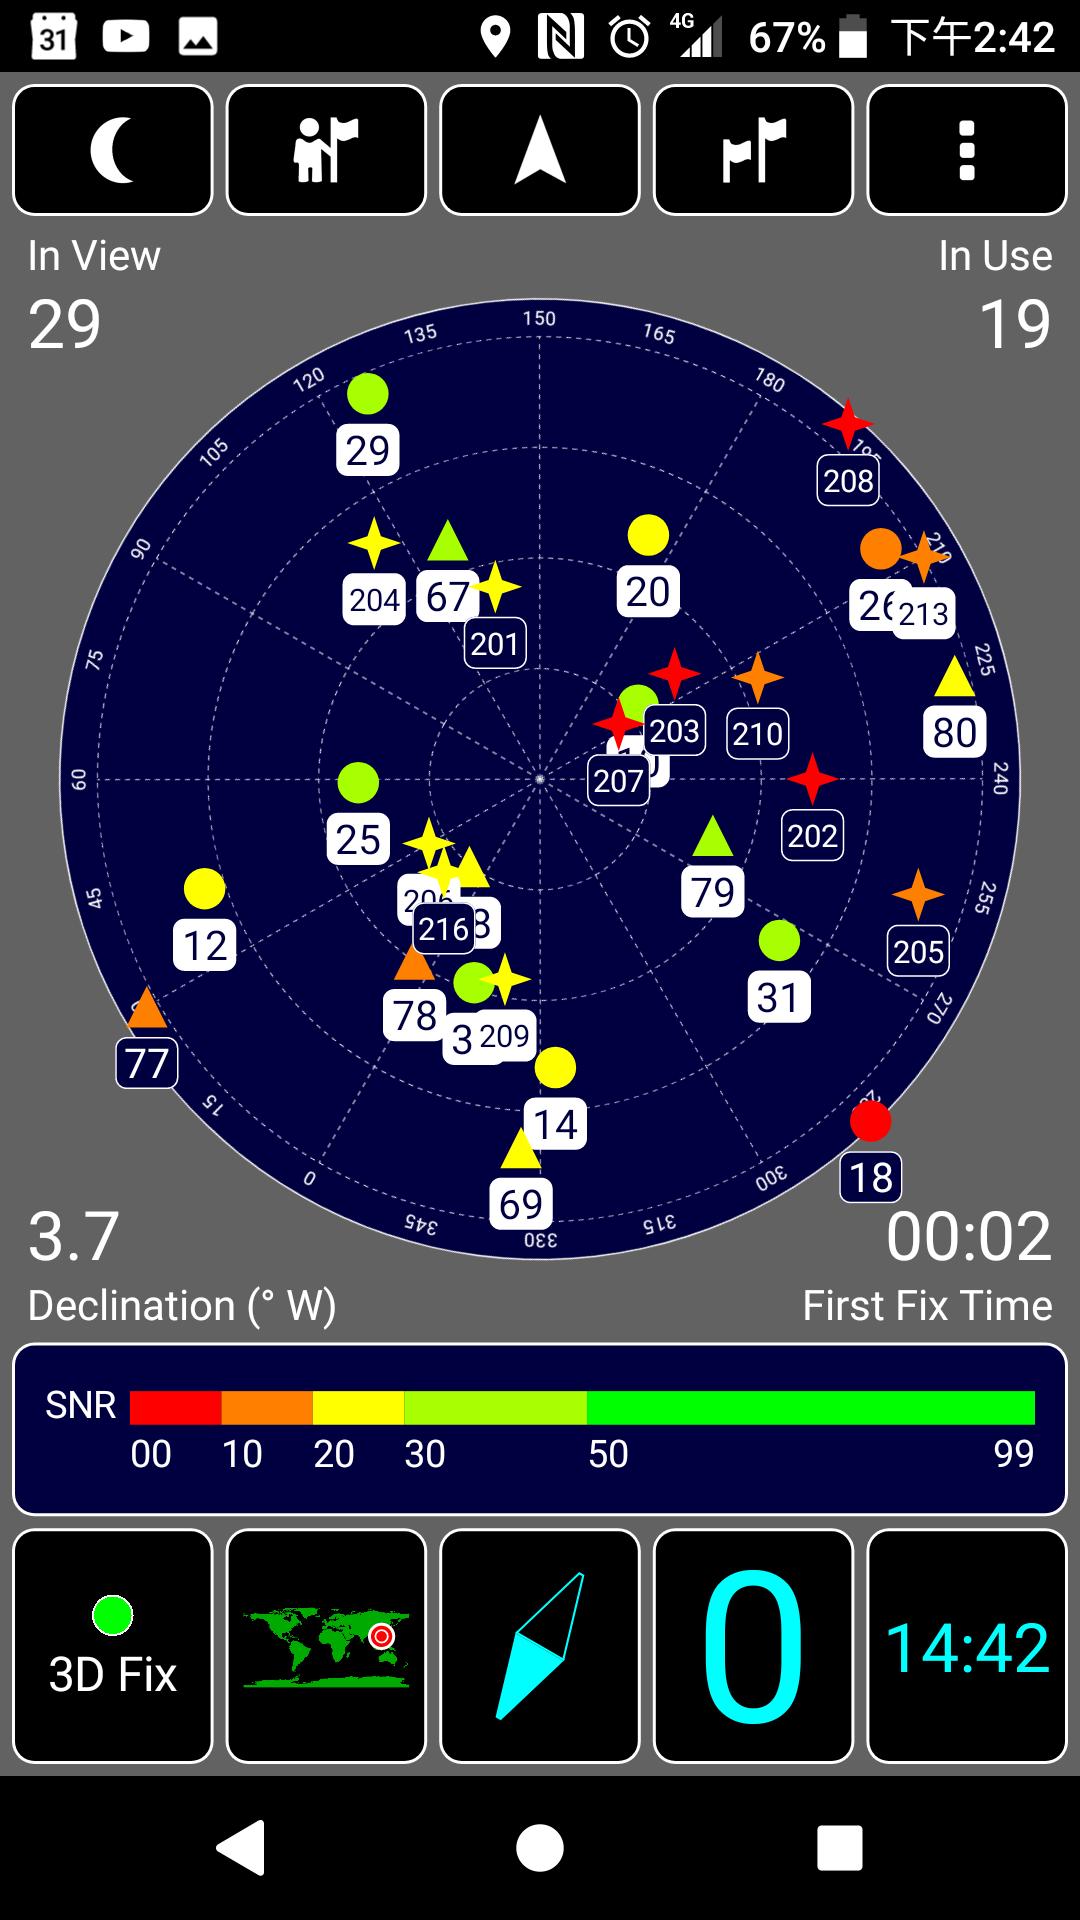 Re: [問題] 請推薦GPS功能強大的手機- 看板MobileComm - 批踢踢實業坊